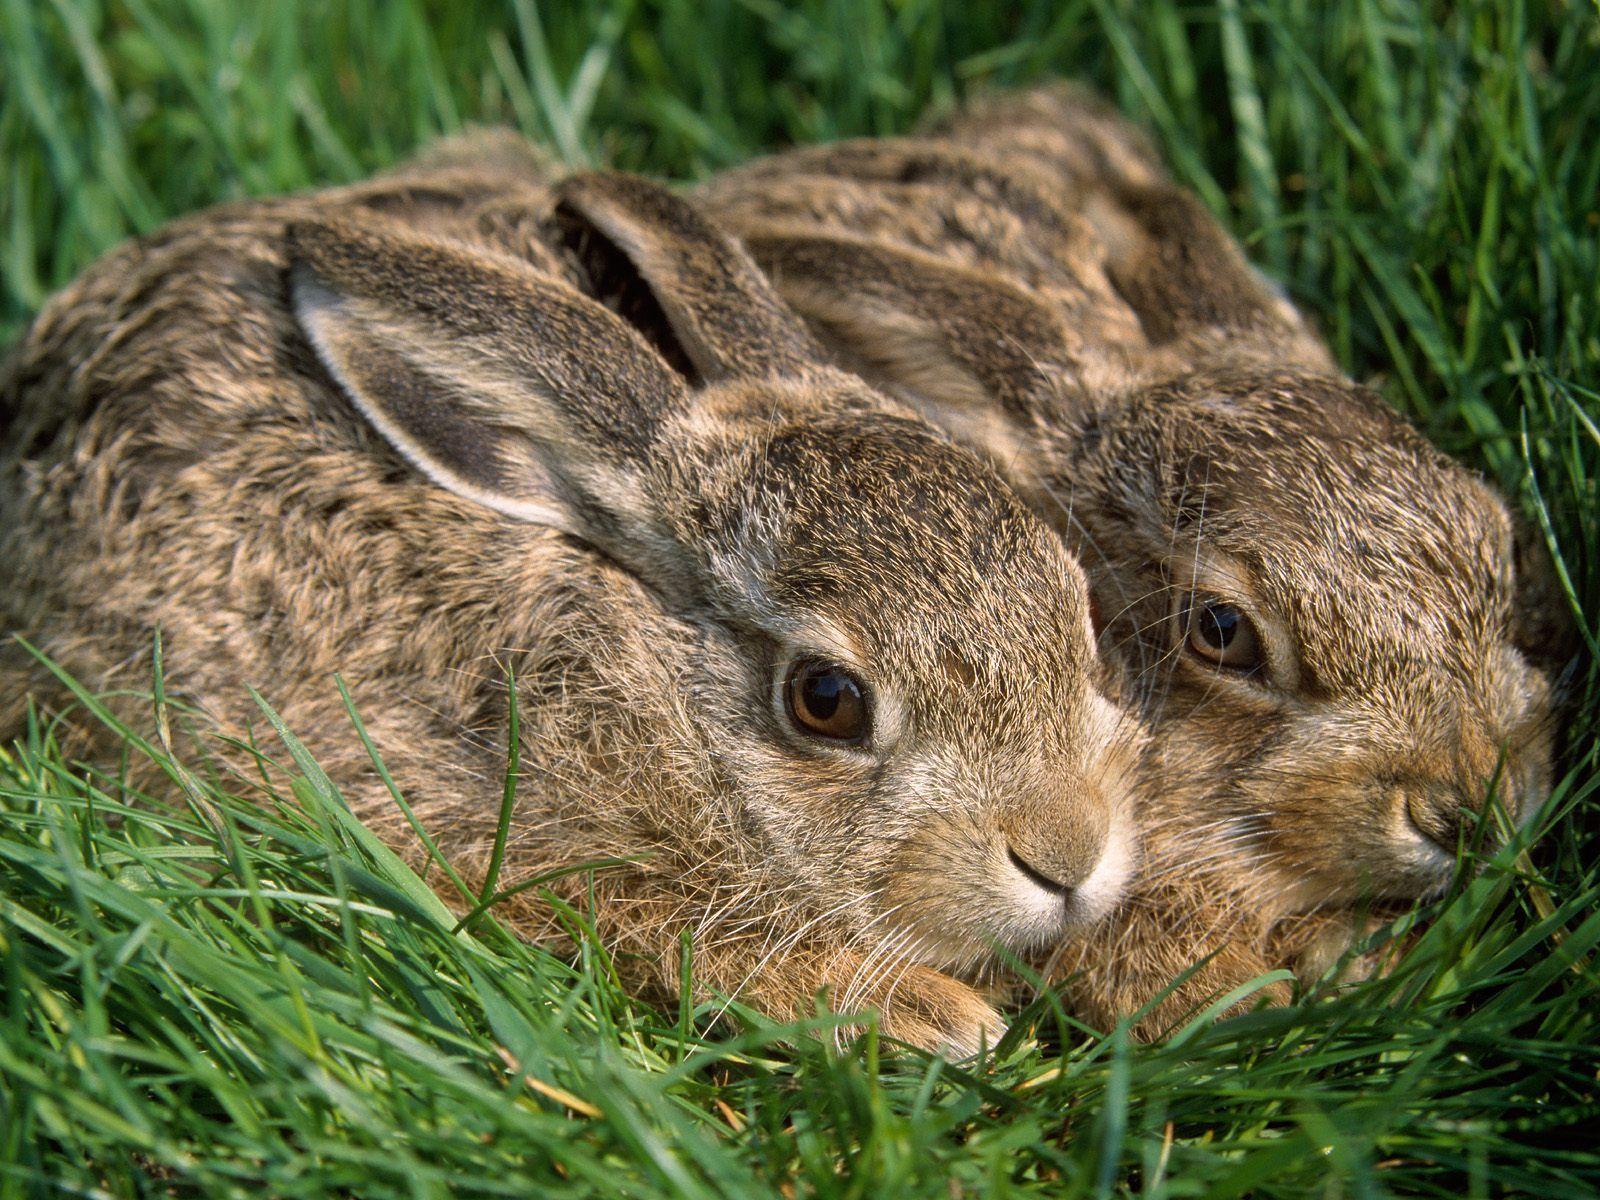 cute pair of bunnies